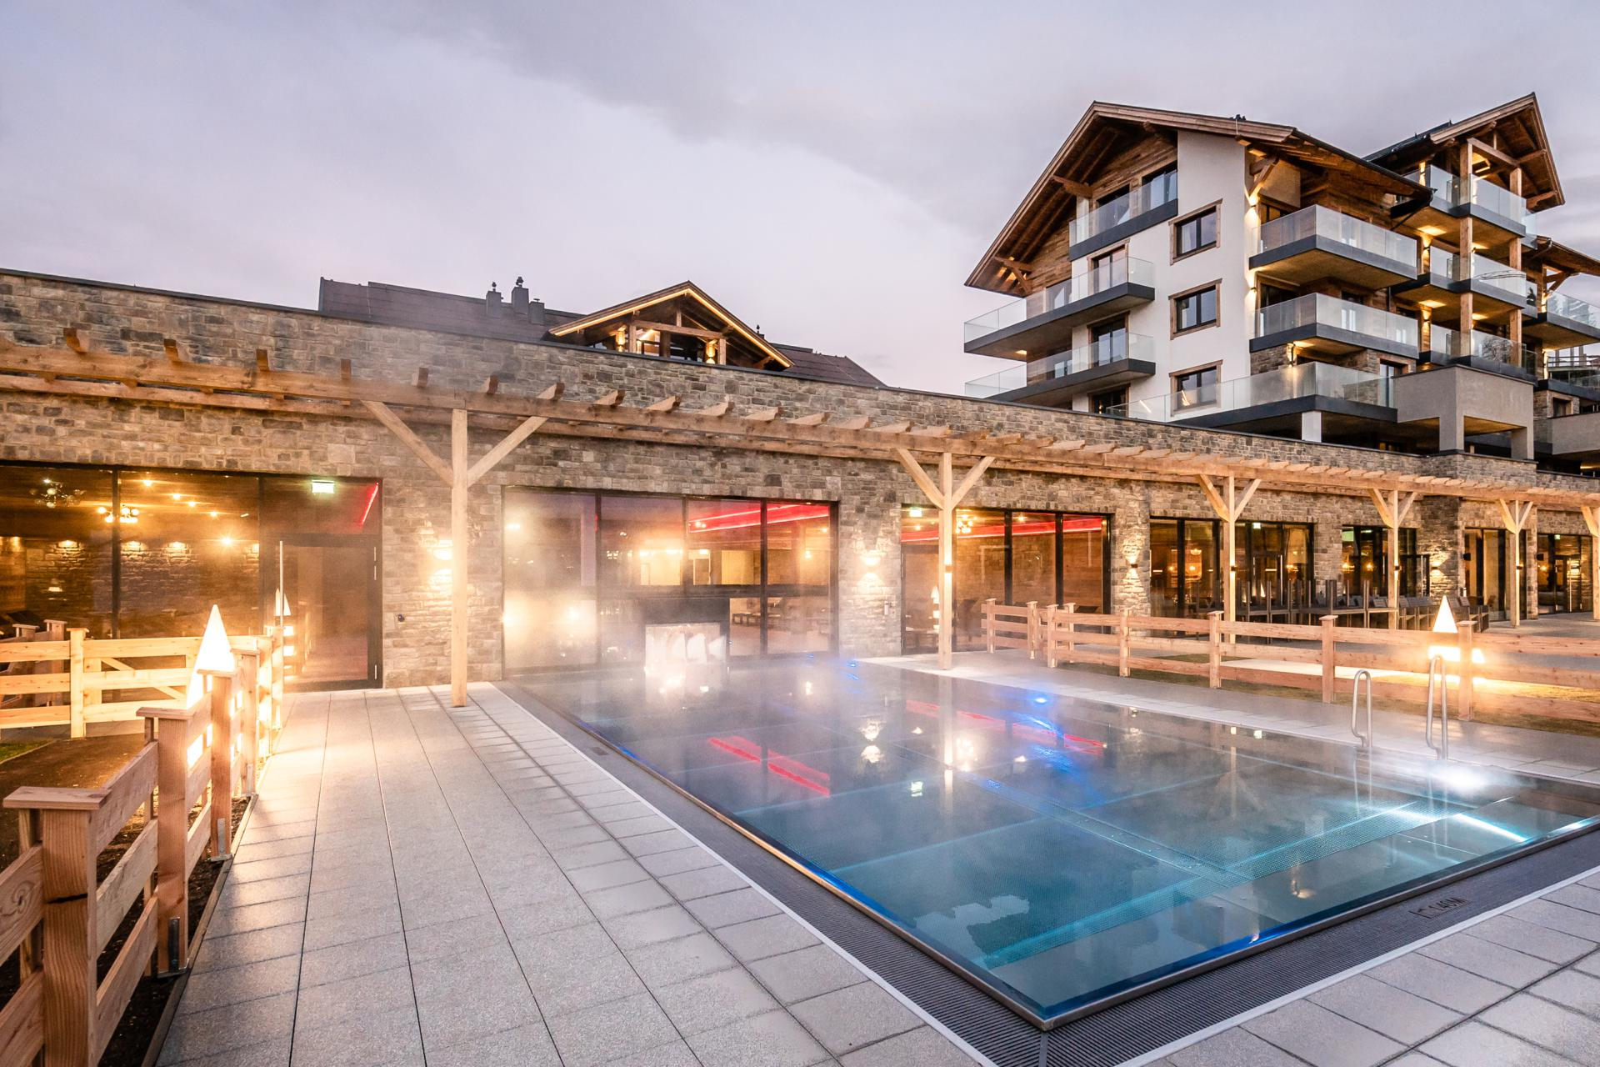 Vaya Fieberfrunn - Hotel